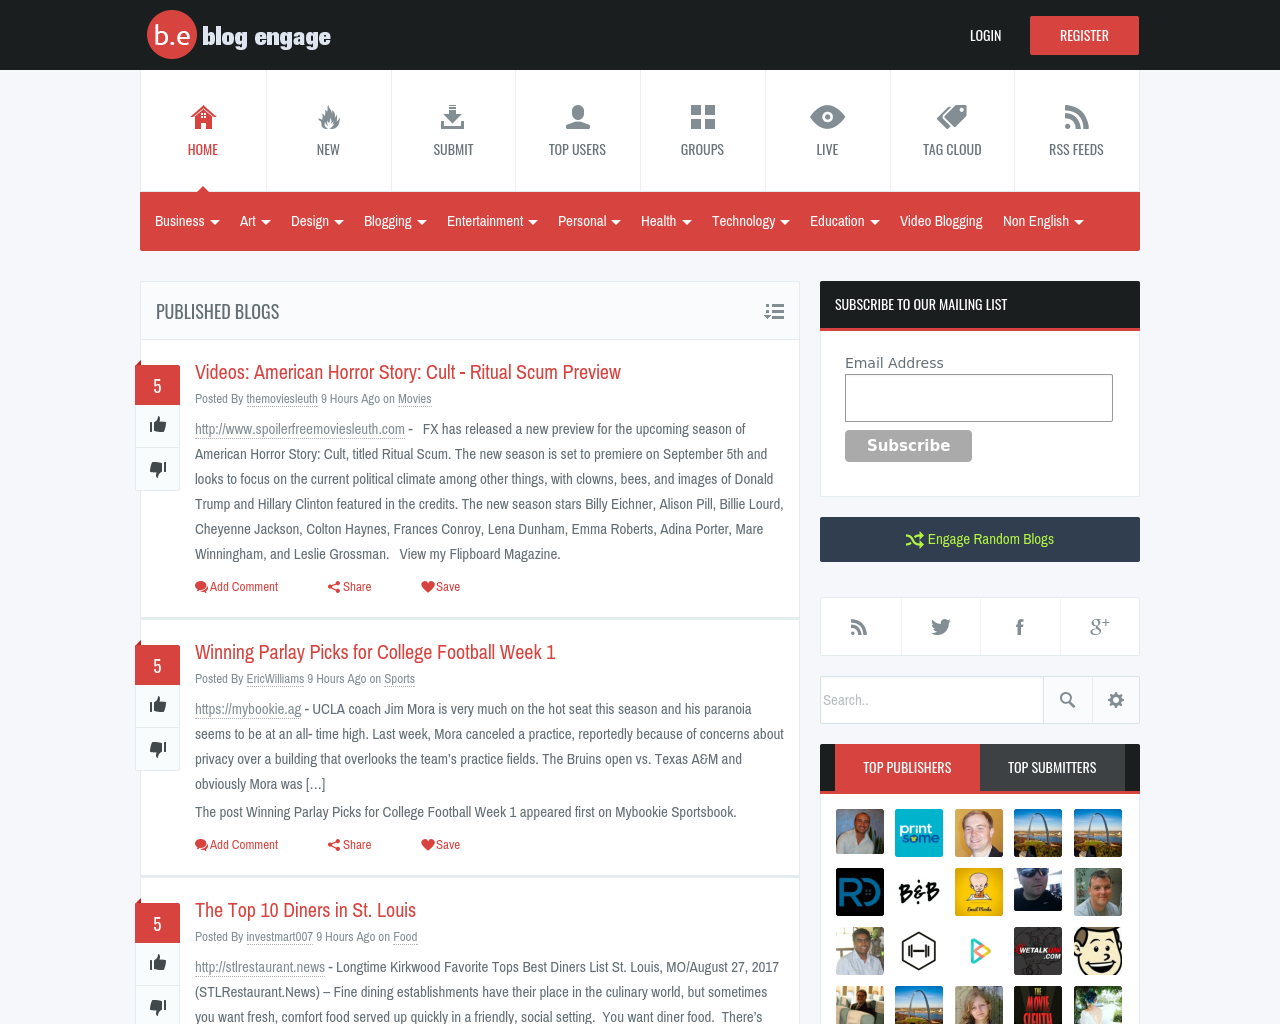 Blog-Engage-Advertising-Reviews-Pricing